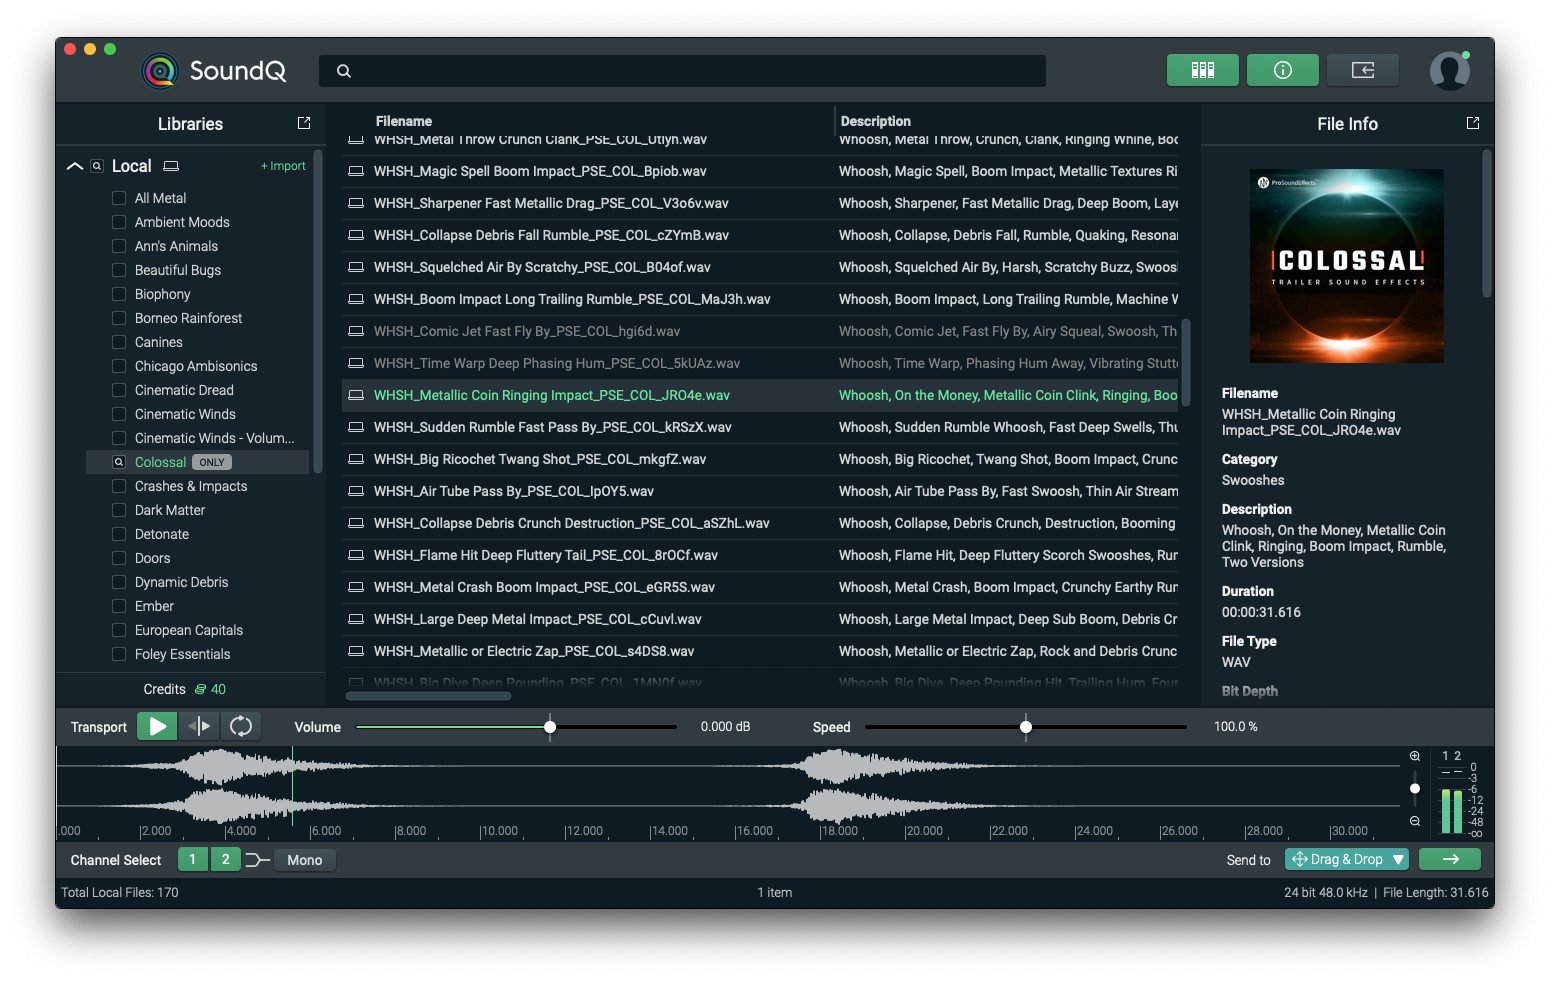 folder-structure-soundq